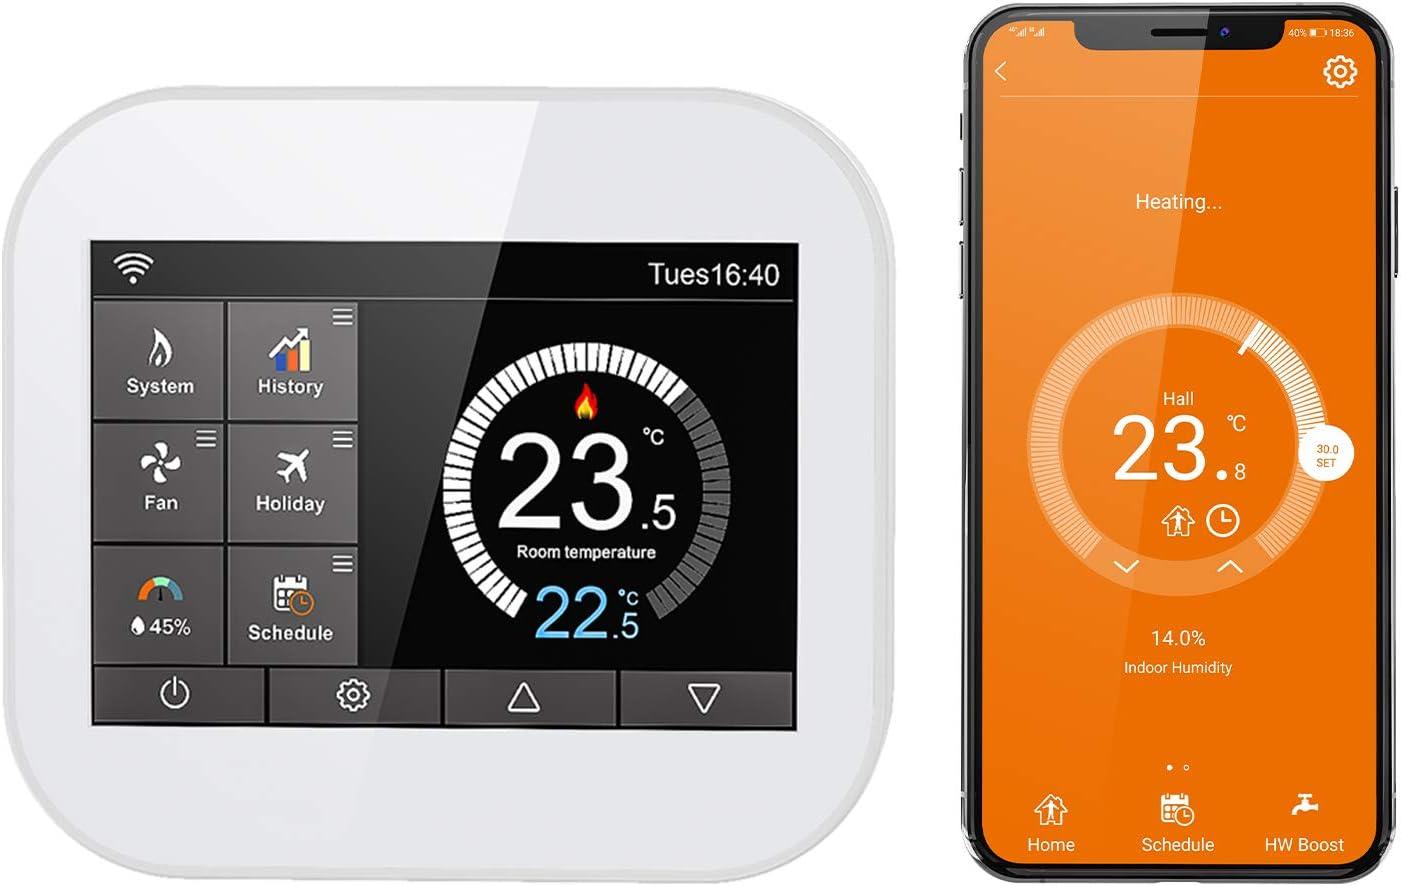 Termostato Inteligente WiFi CURCONSA para Calderas de Gas, Pantalla Táctil TFT Color de 3.5 Pulgadas, Compatible con Aleax, Asistente de Google. (Agua / calefacción eléctrica, Blanco)